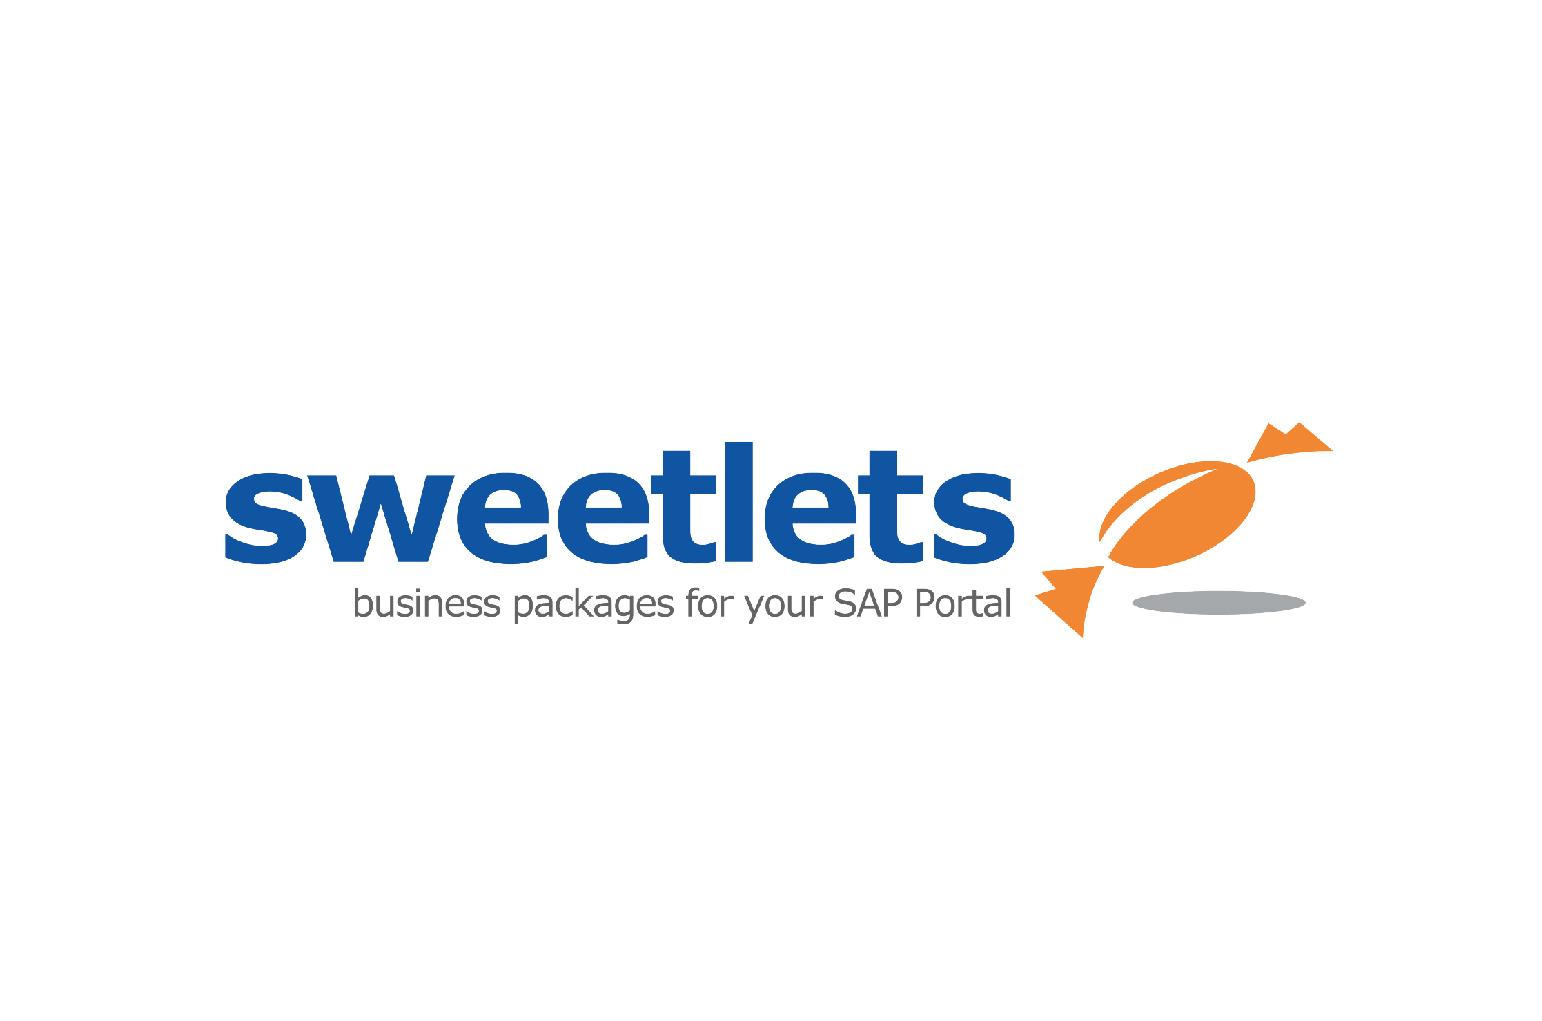 sweetlets